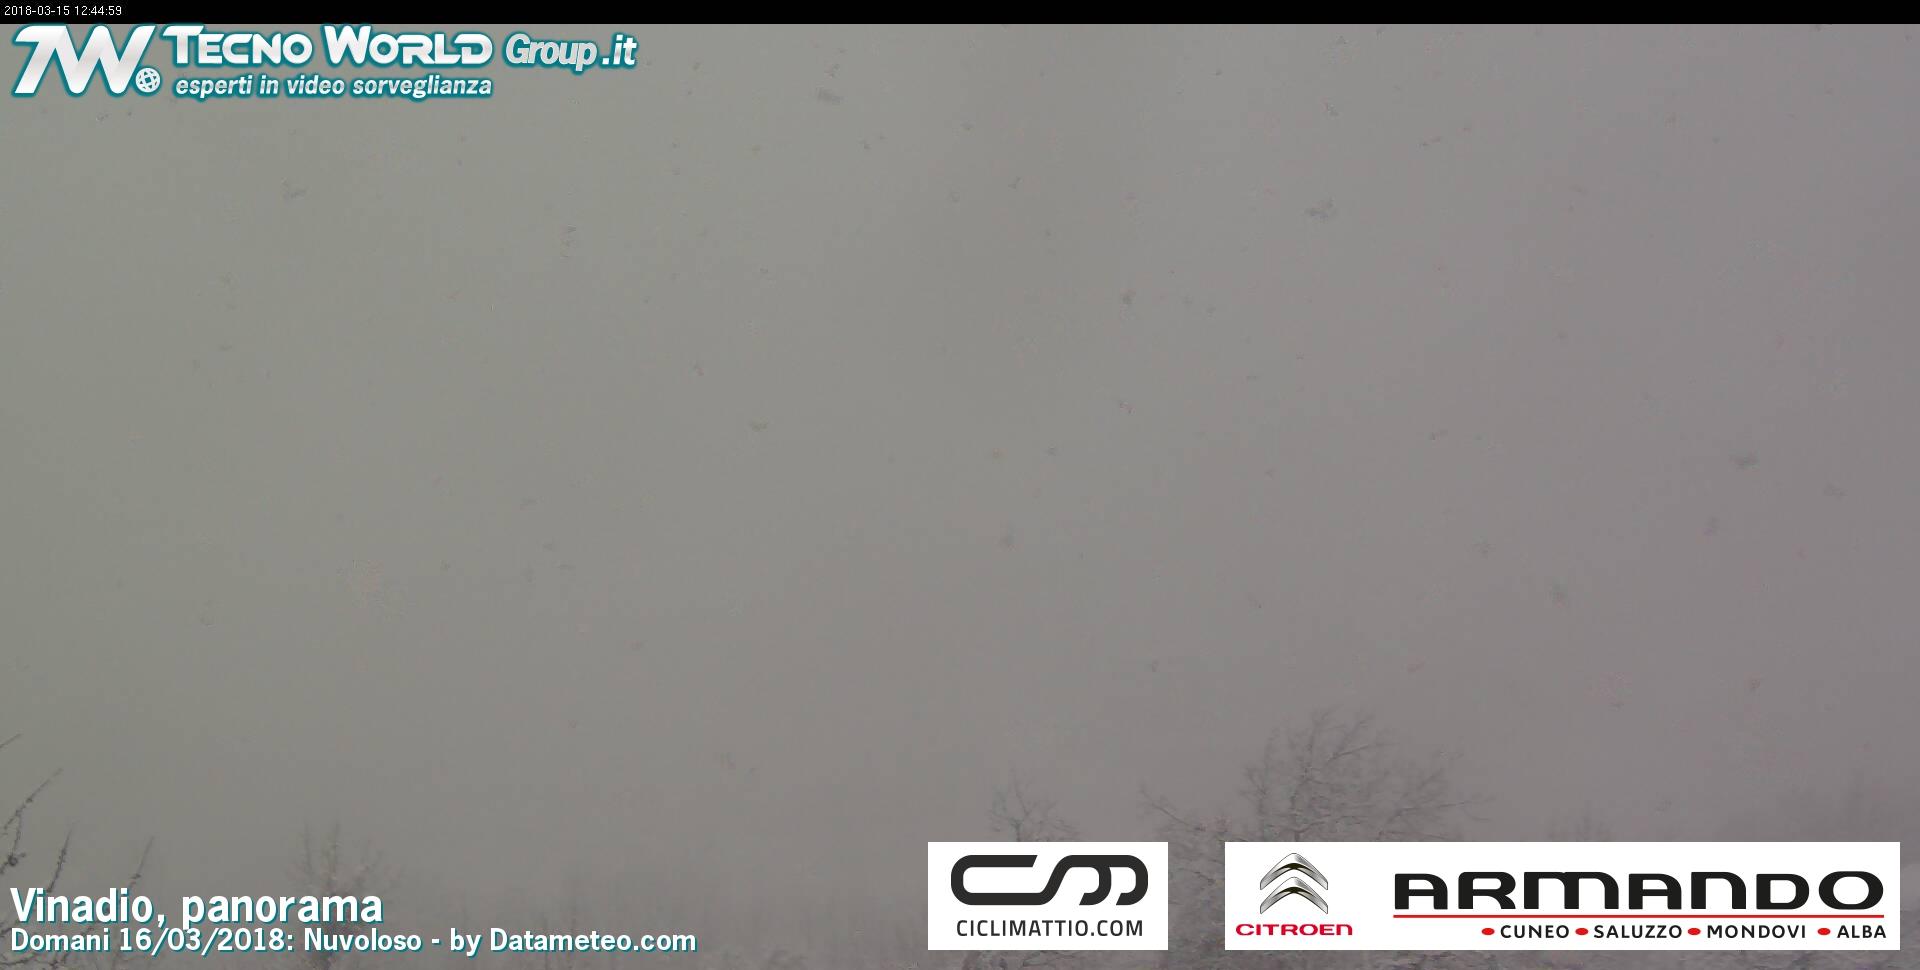 Basso Piemonte 1  - 15 marzo primavera meteorologica-vi01.jpg